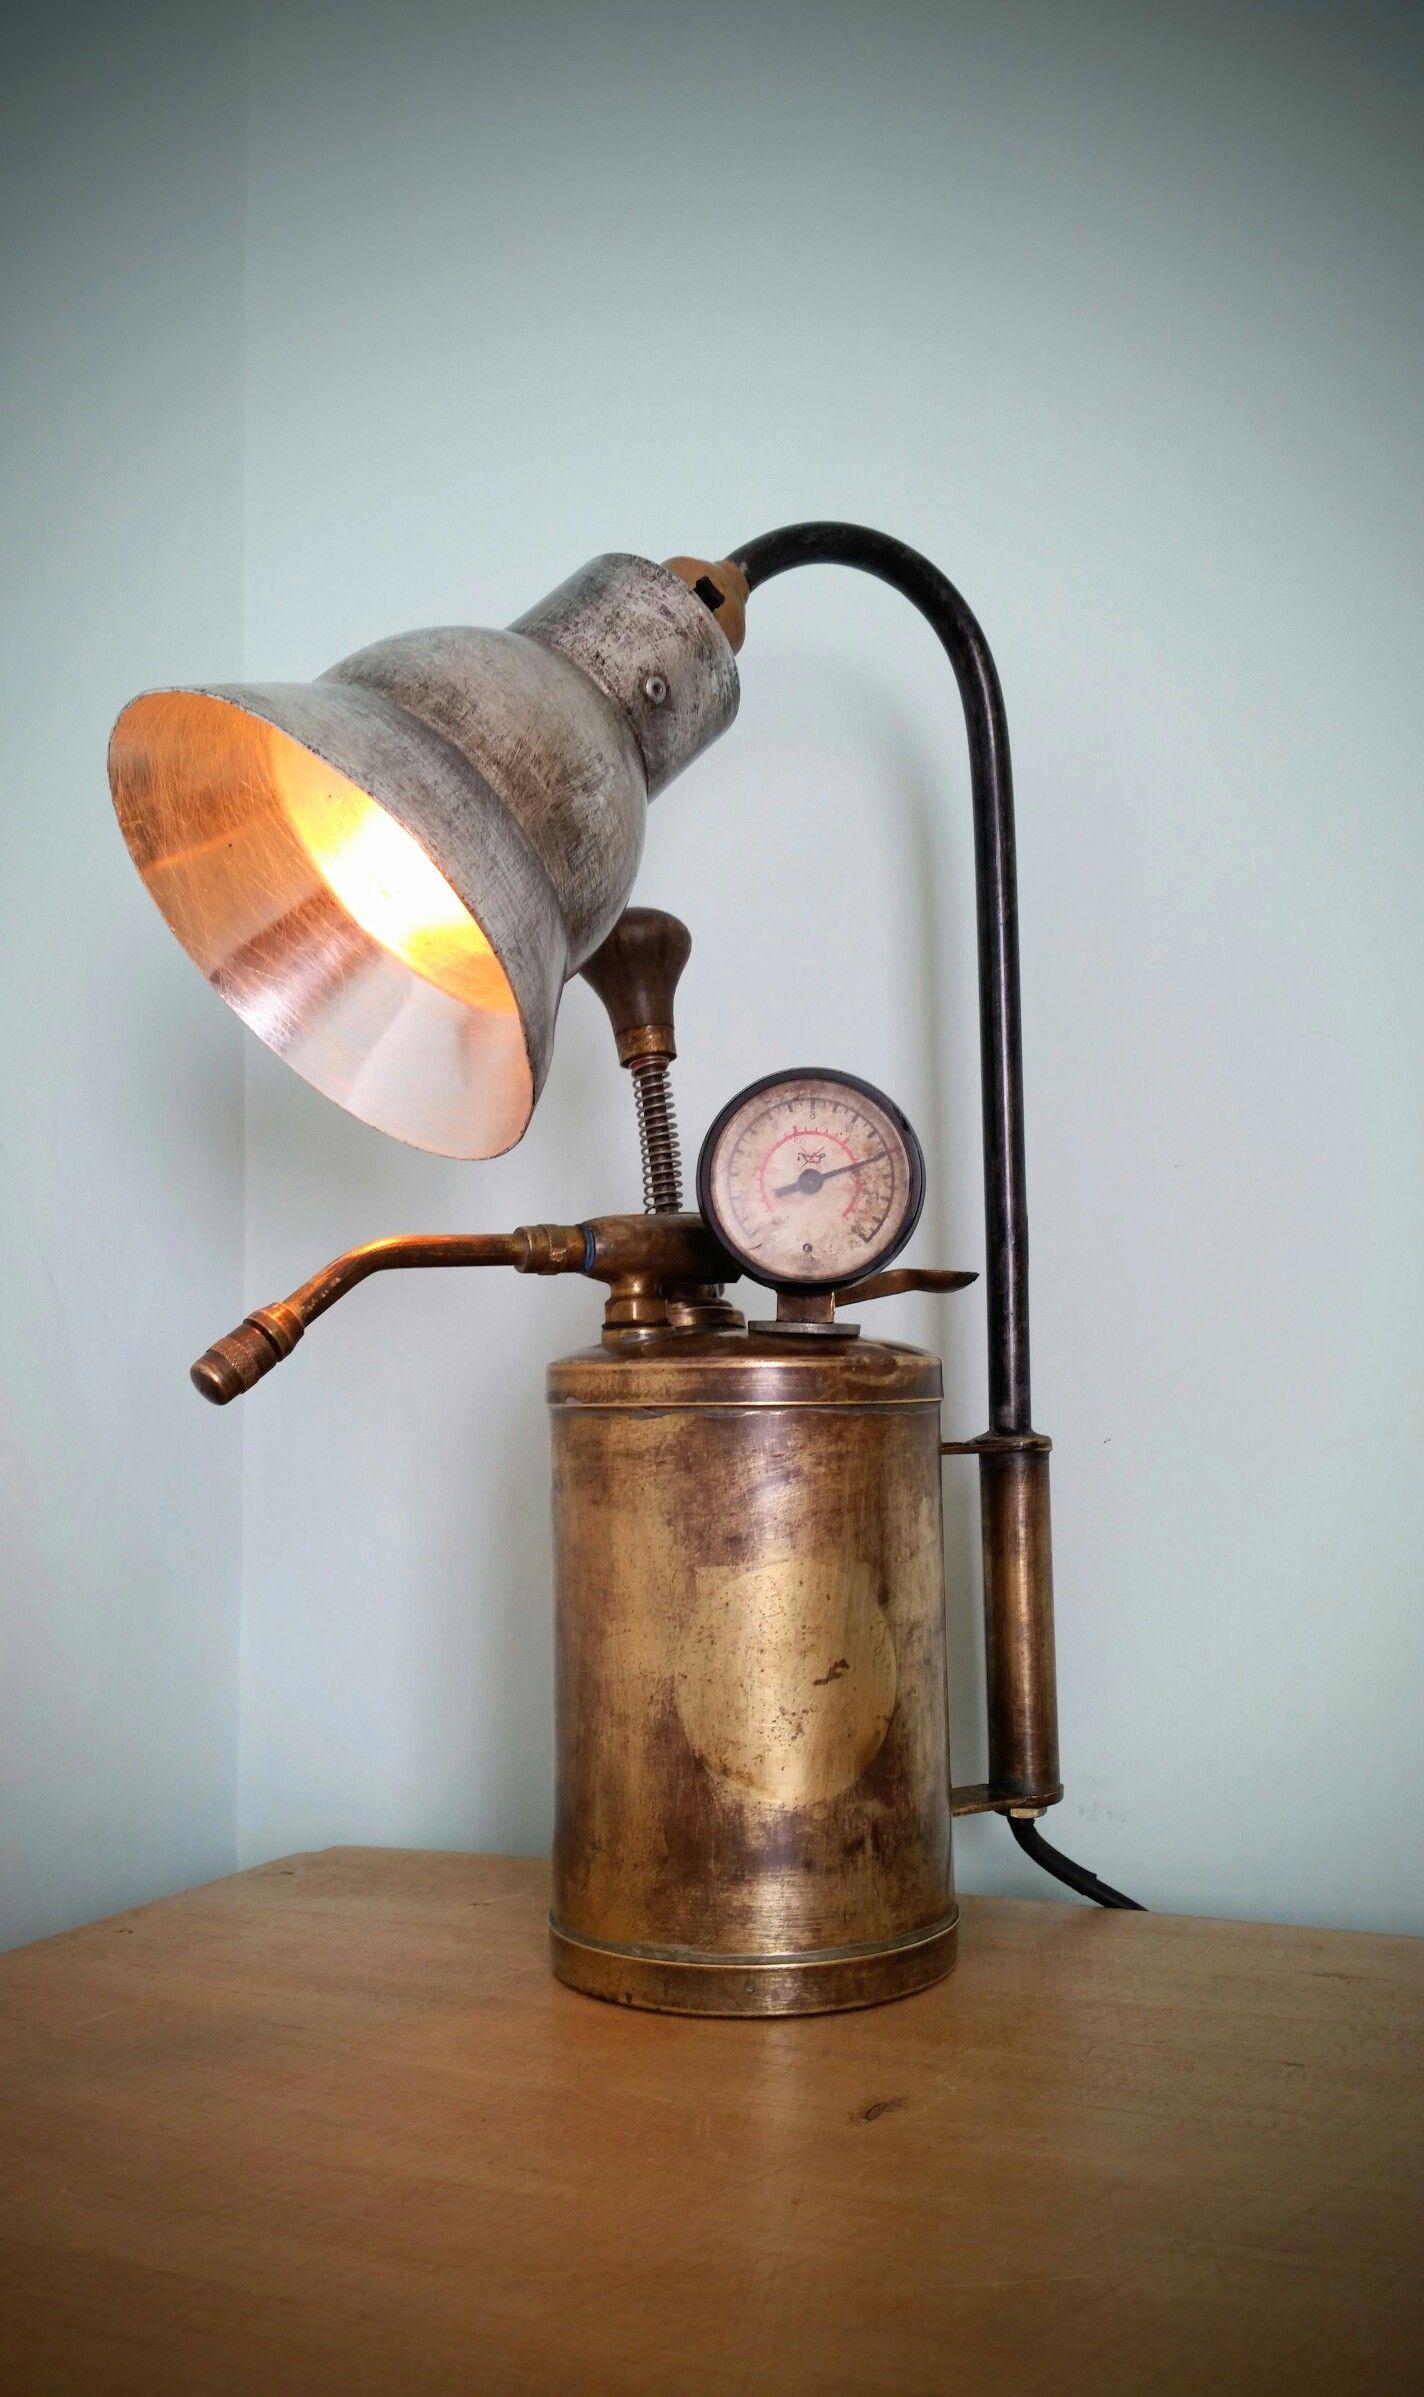 Ideal presen Vintage Industrial Retro Pipe Lamp Steampunk style Rock Star